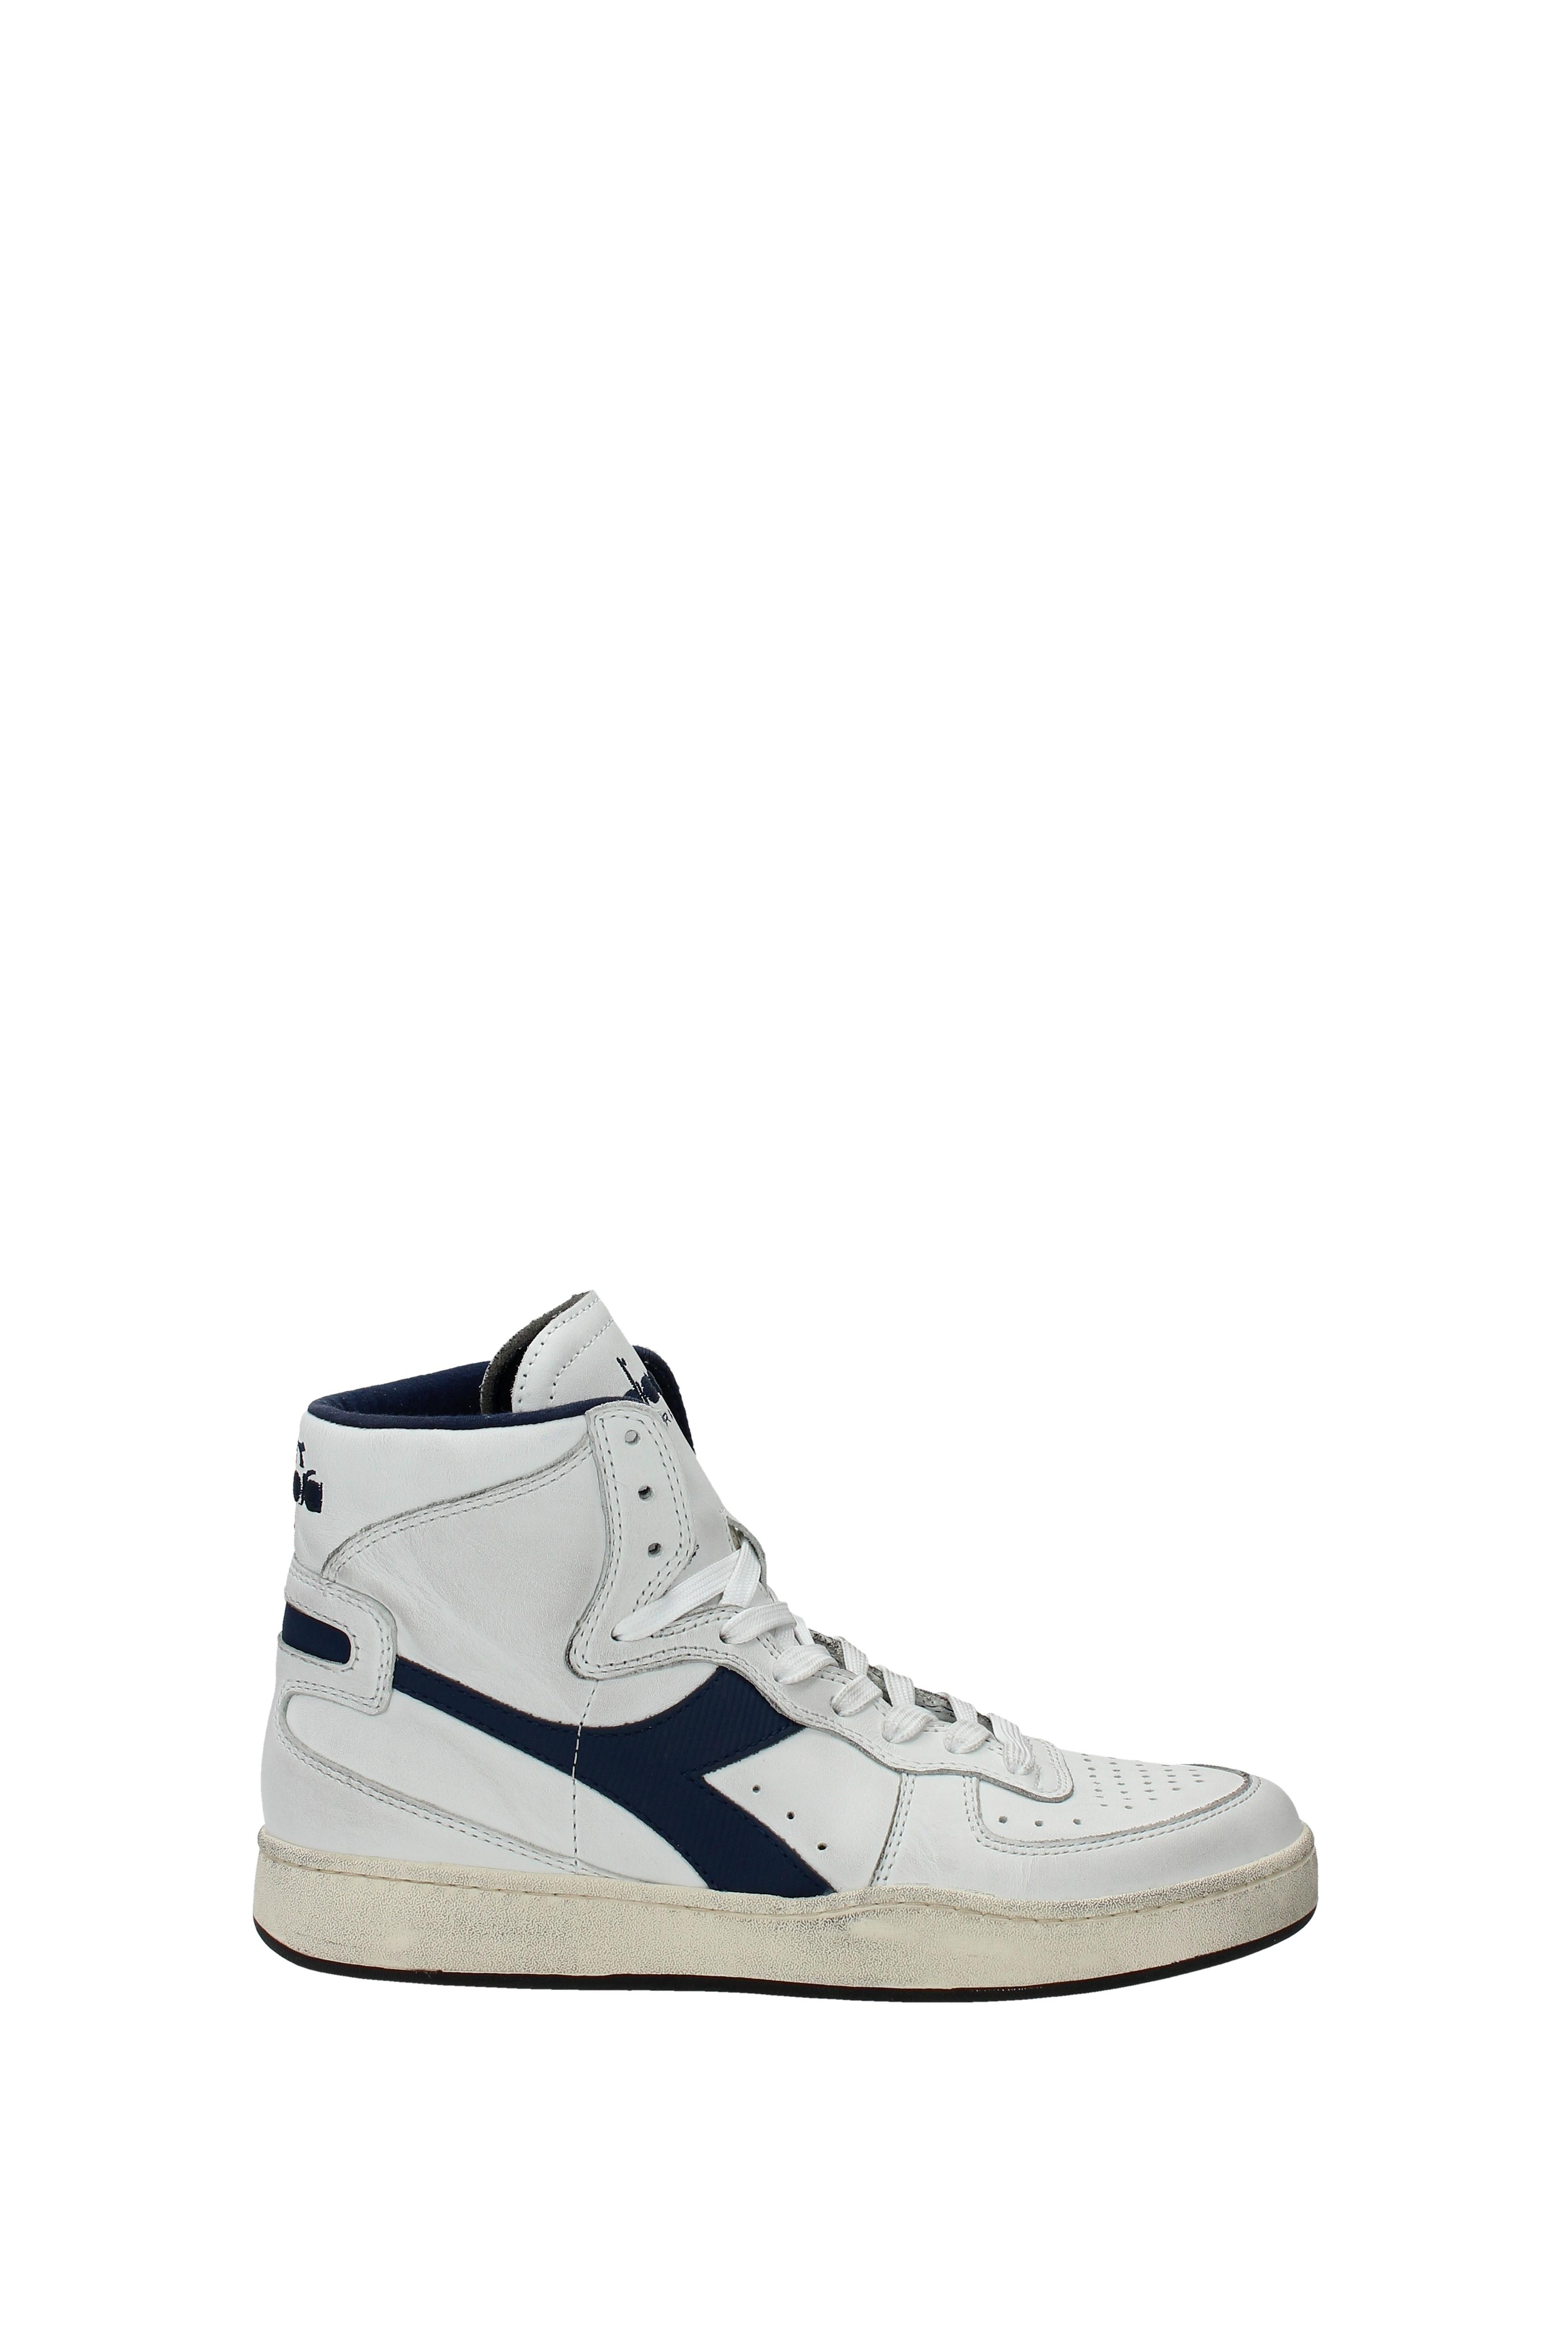 Sneakers Diadora (20115856901) Heritage Herren - Leder (20115856901) Diadora 049a87